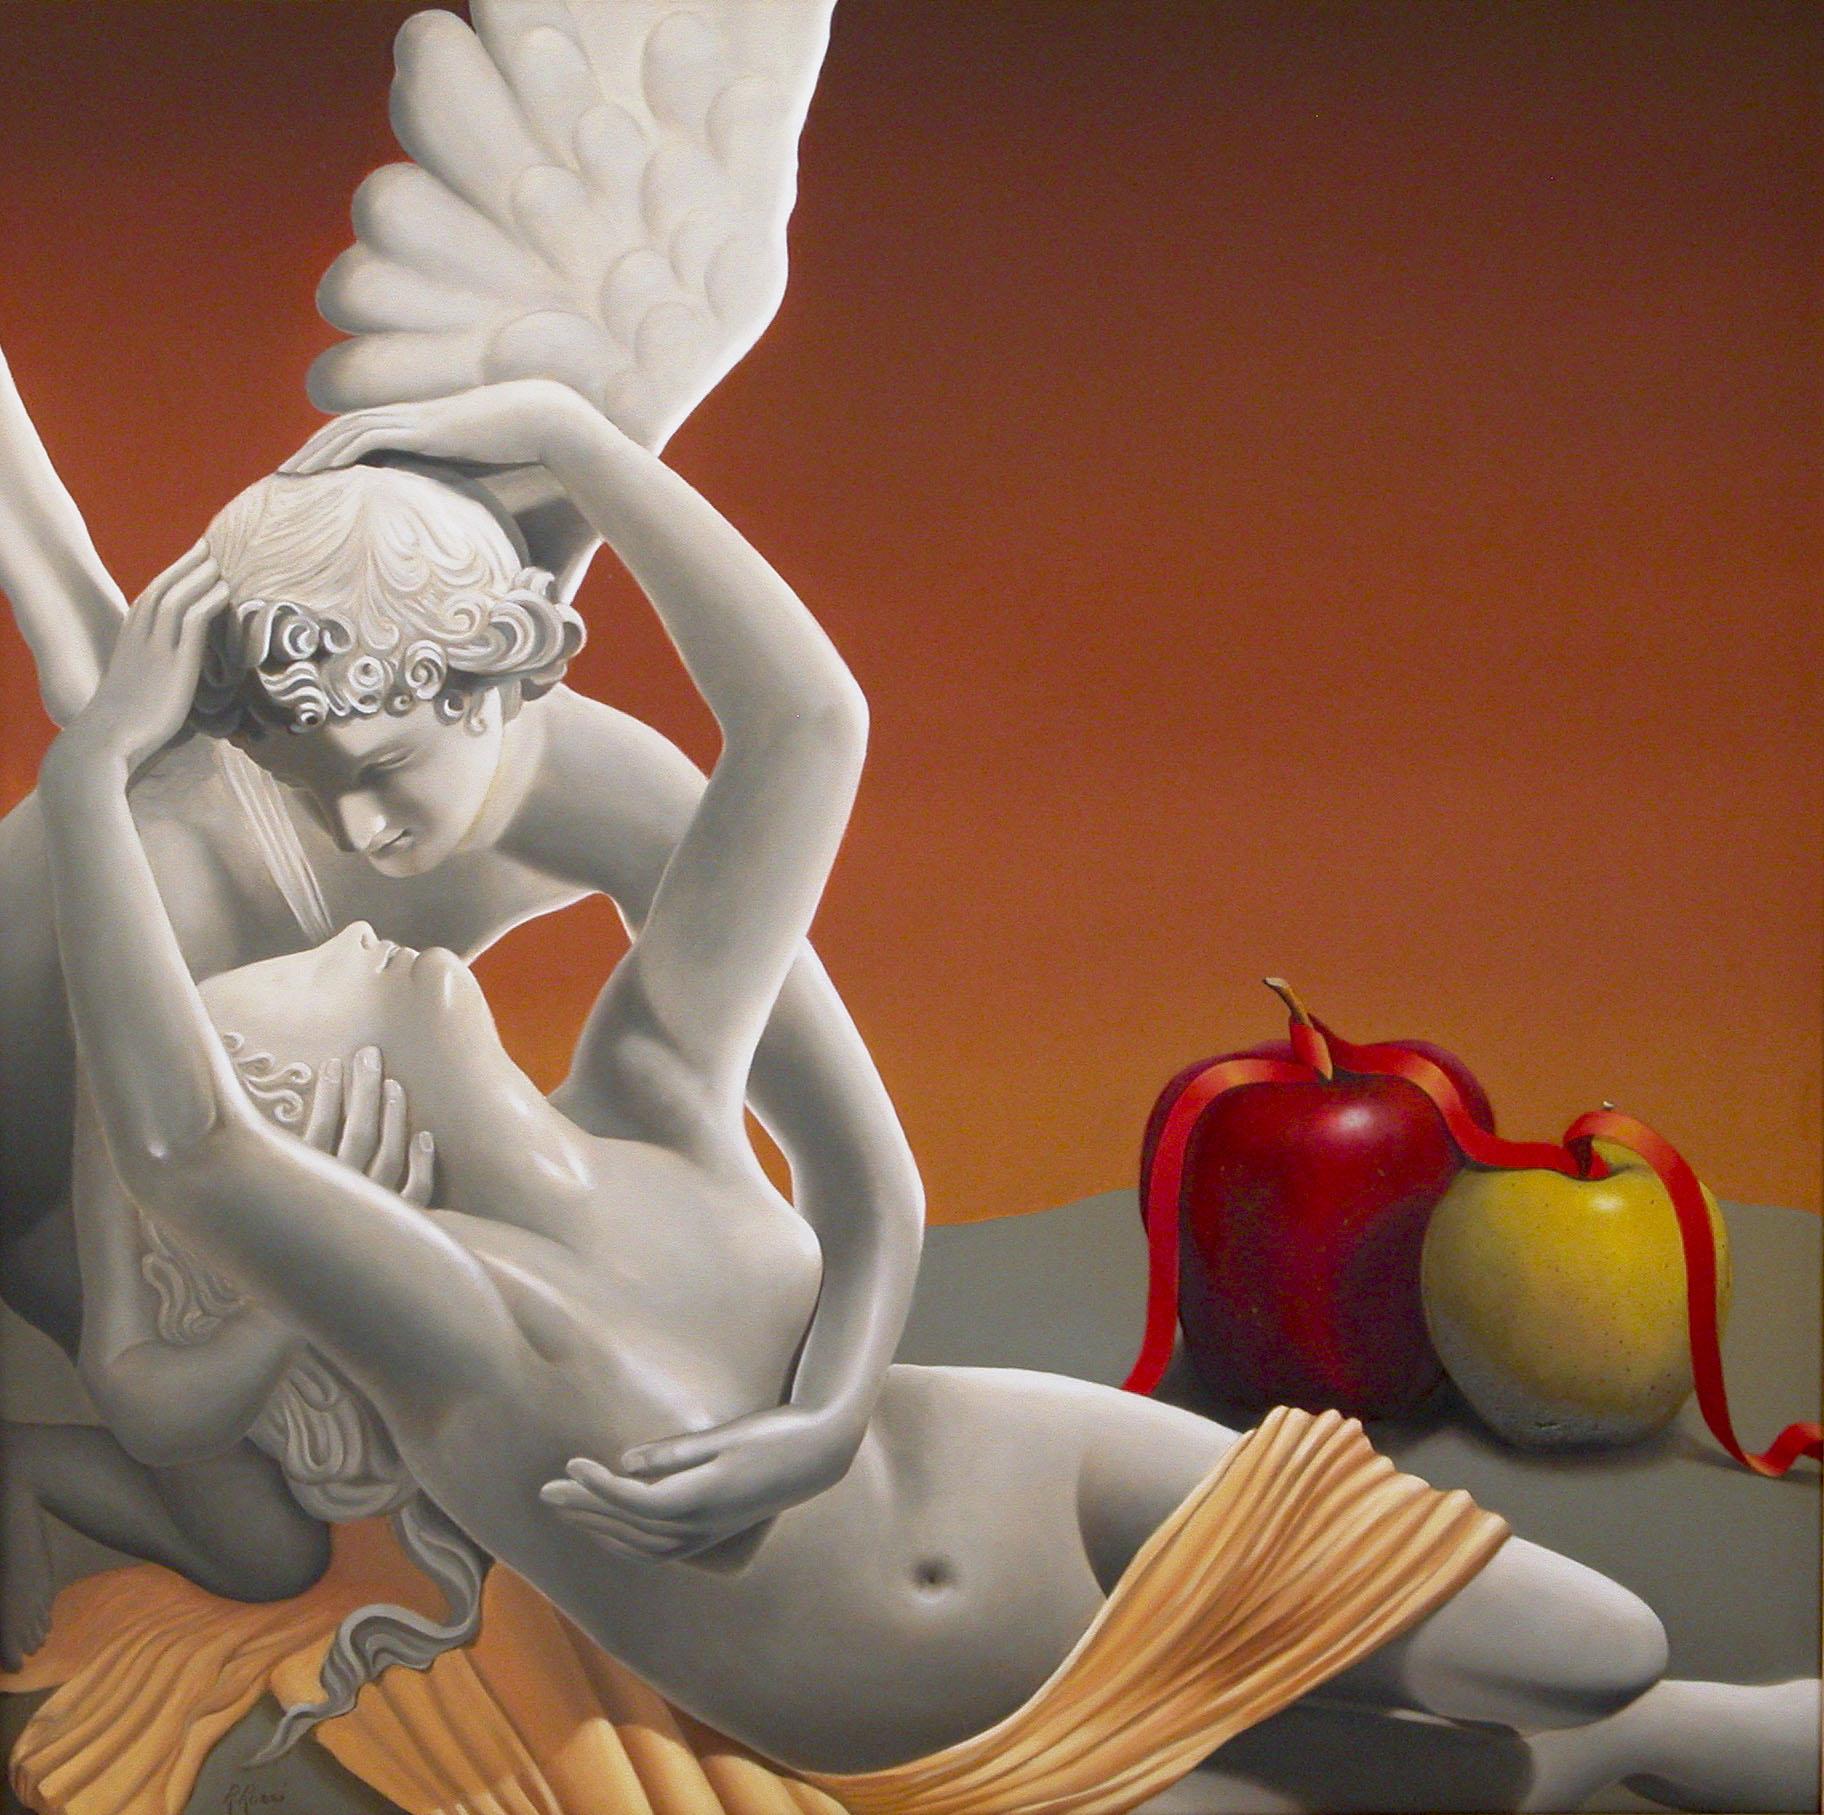 2007 roberta rossi - Eros risveglia Psyche - olio su tela - 60 x 60